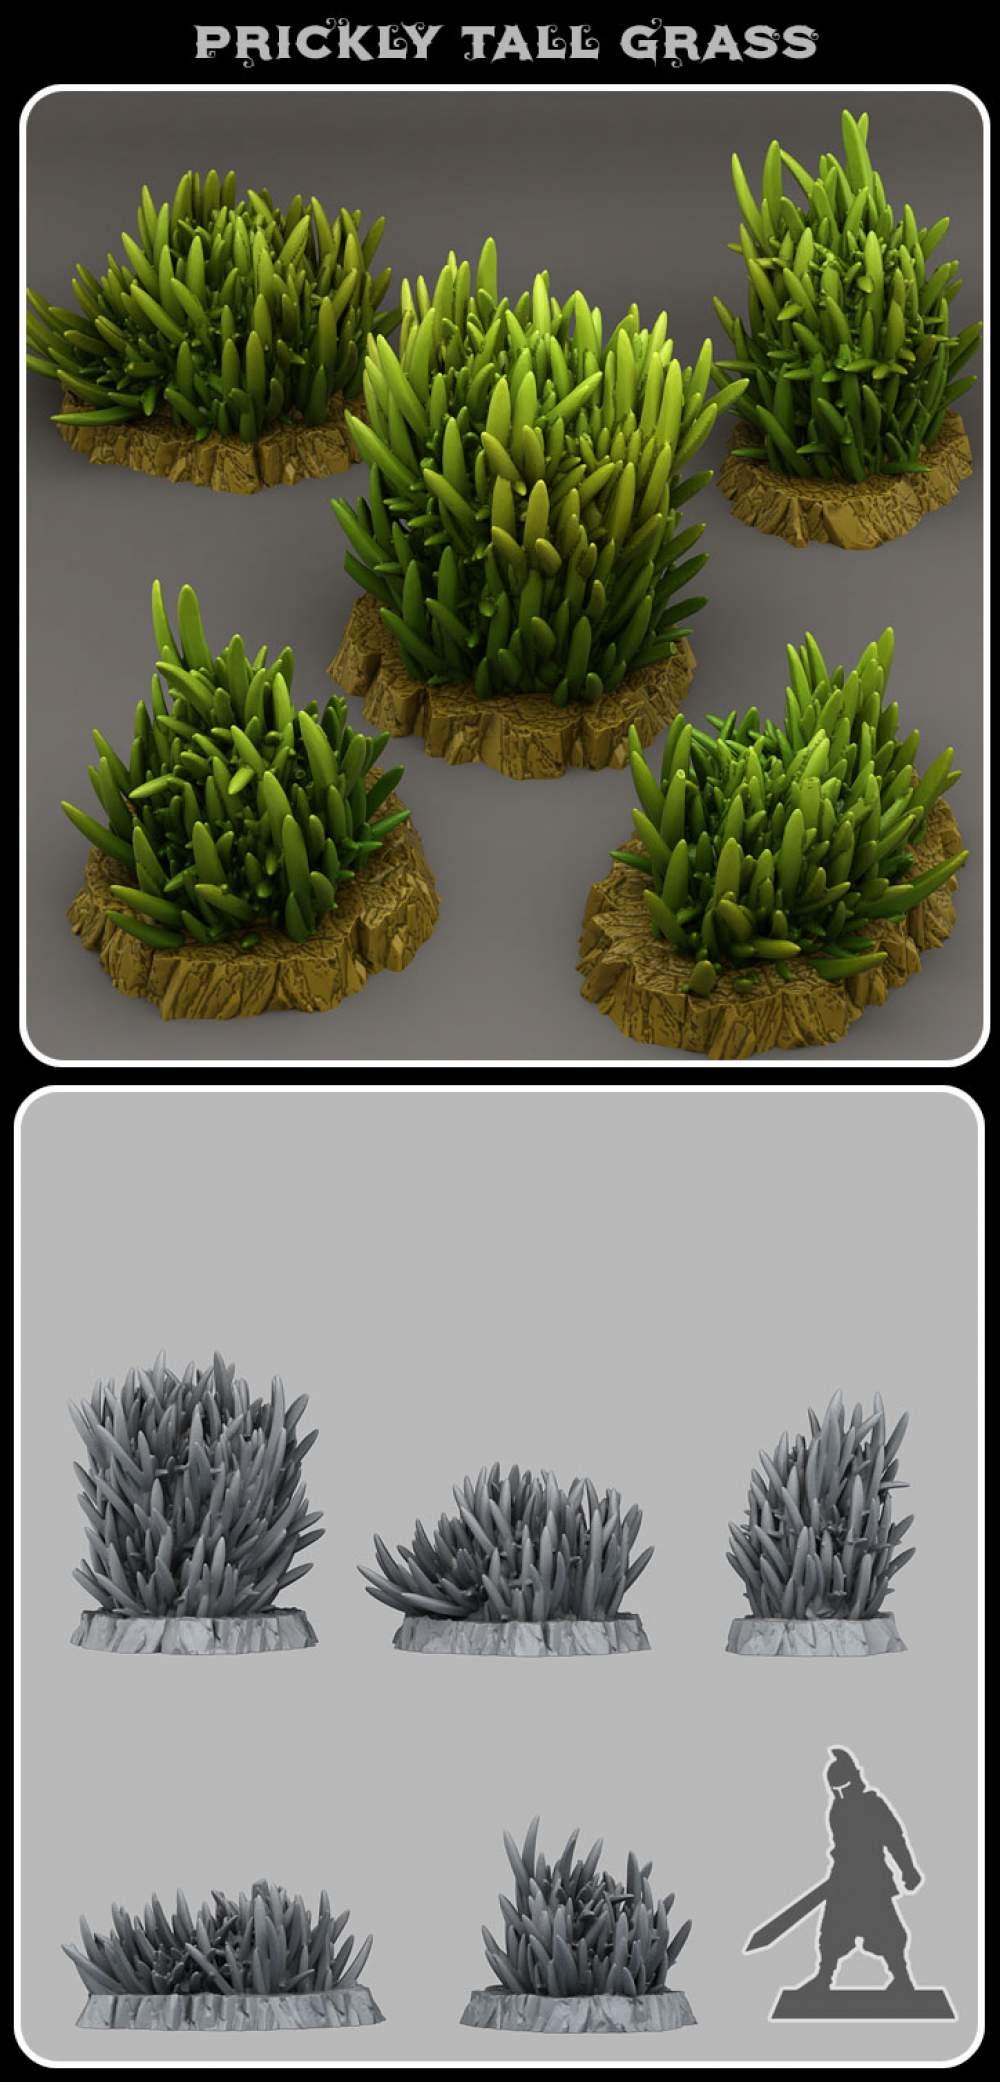 Prickly tall grass